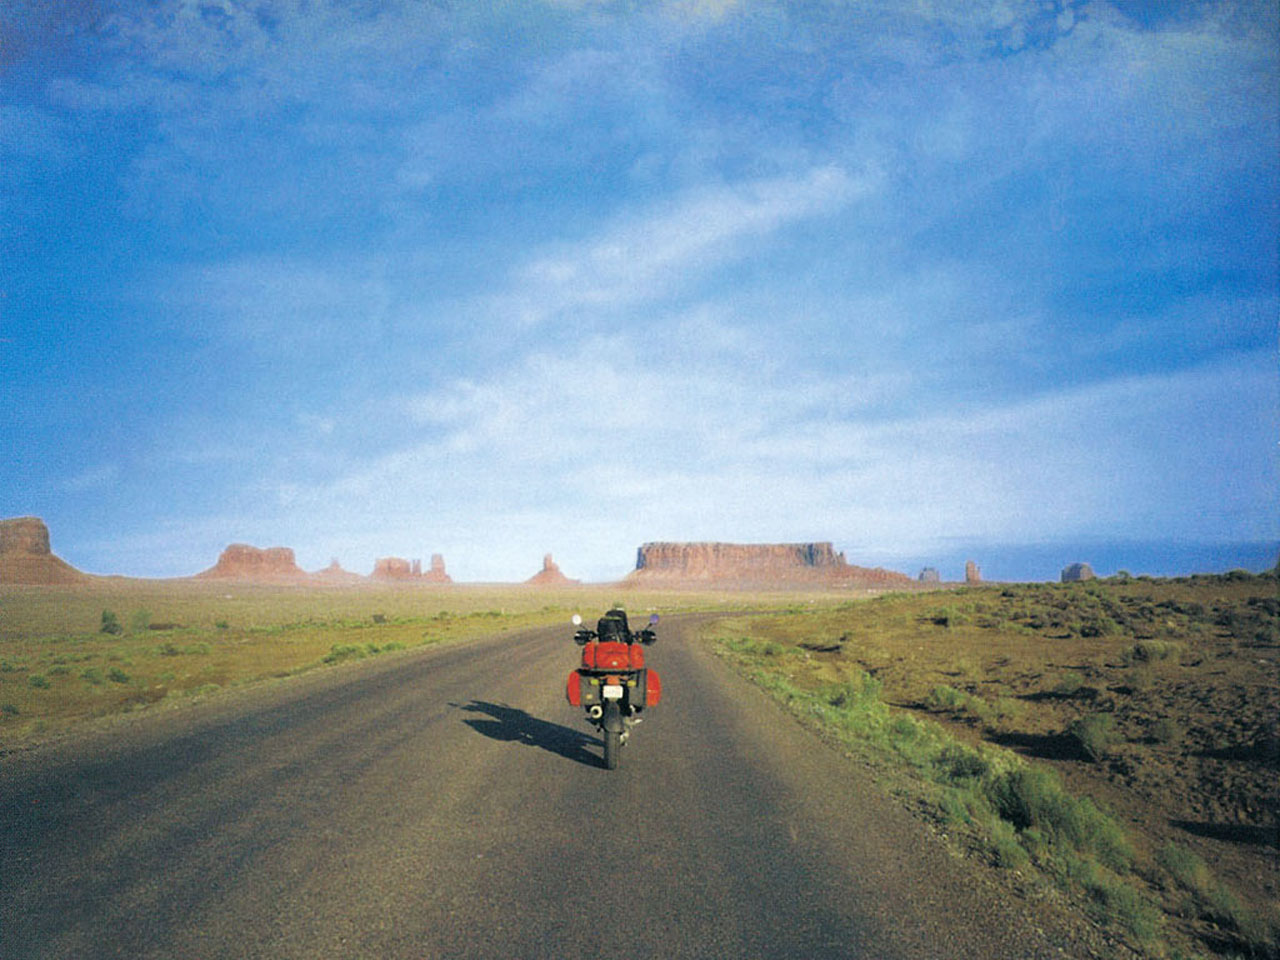 traveling scenic roads open highways